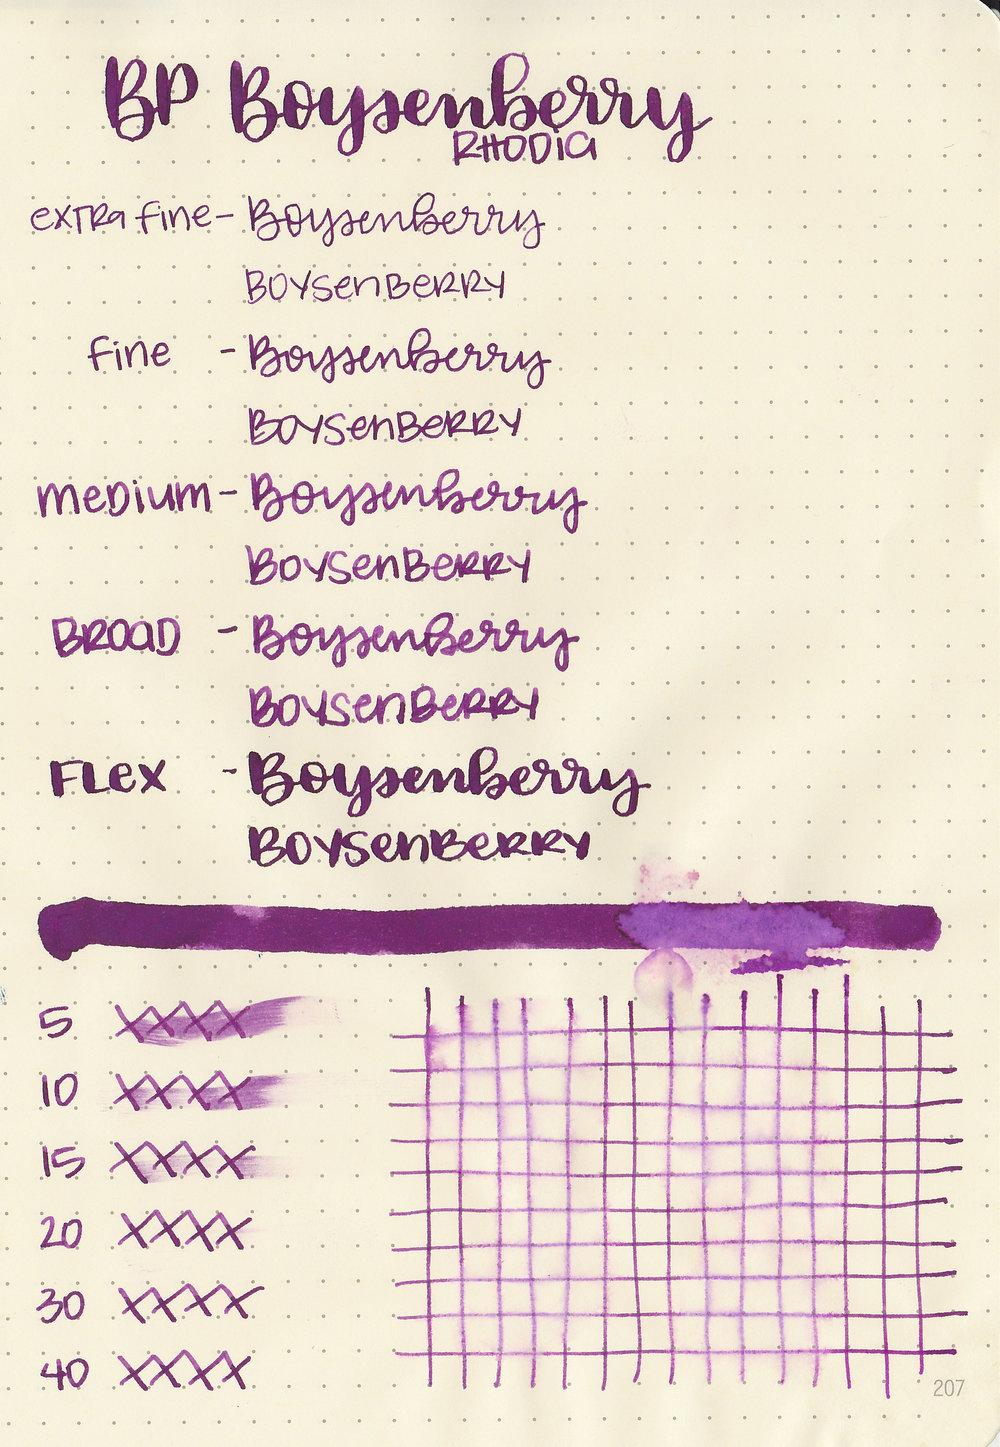 bp-boysenberry-12.jpg